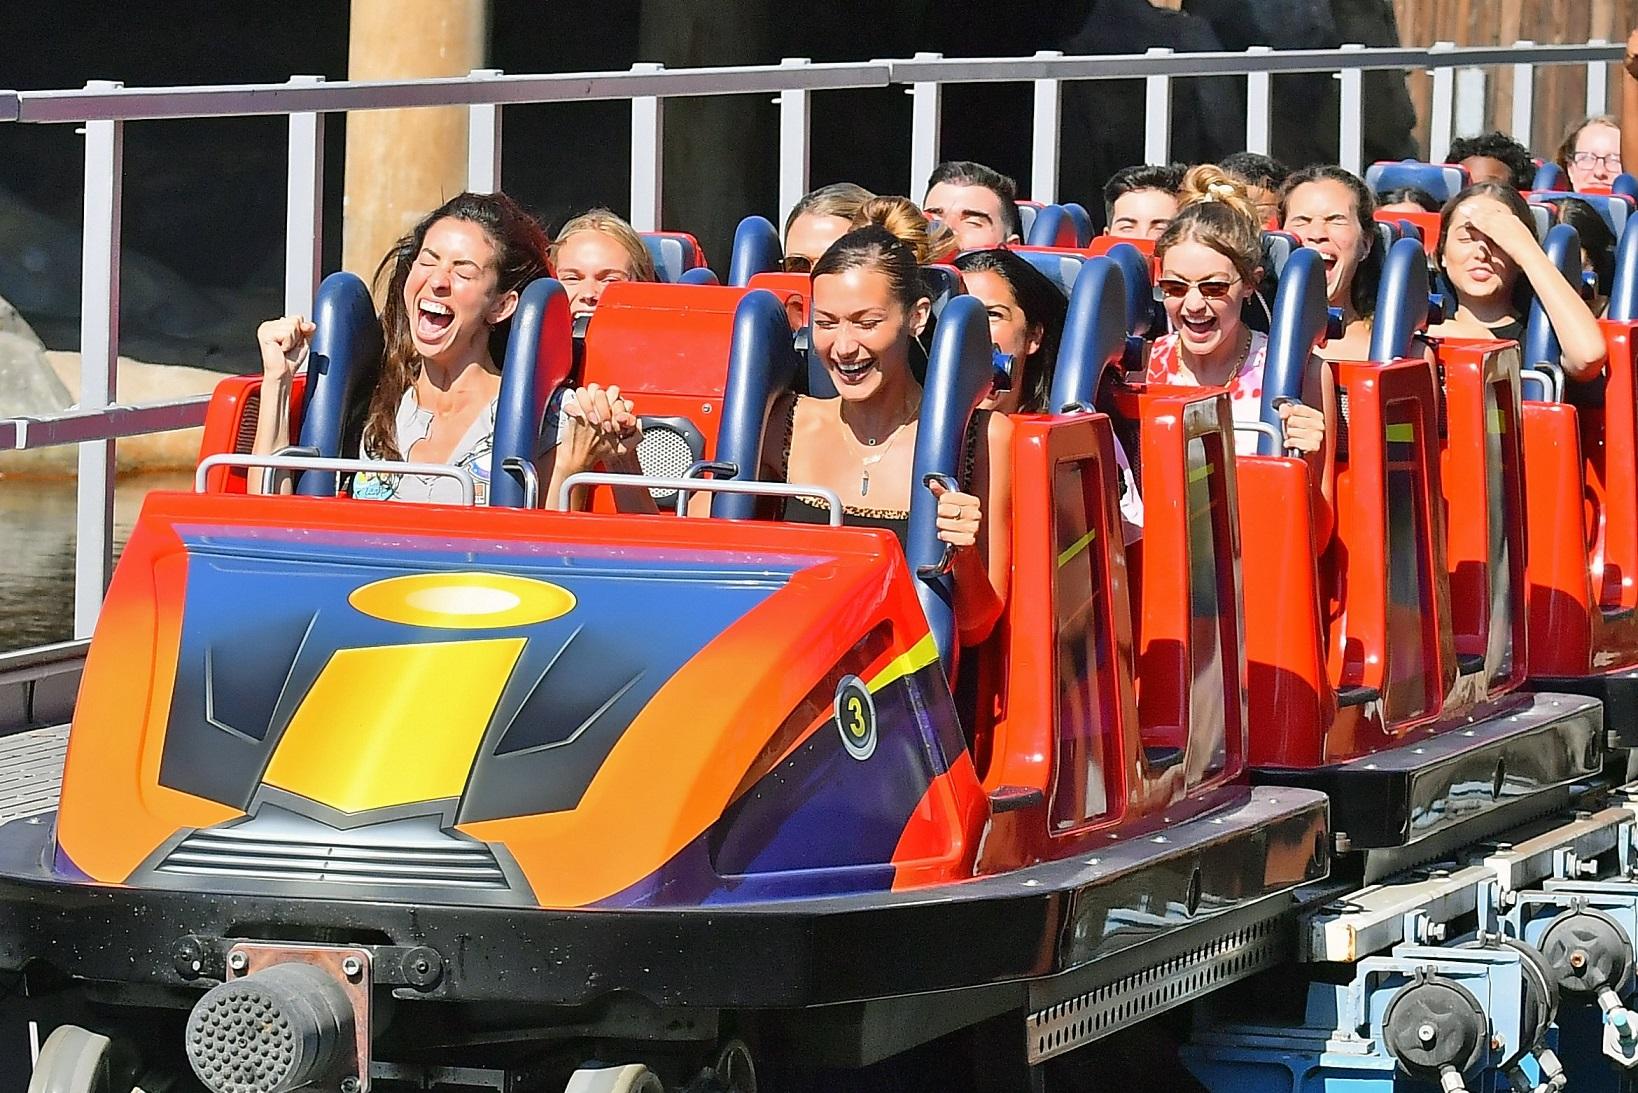 ** PREMIUM EXCLUSIVE RATES APPLY **Gigi Hadid and Bella Hadid celebrate their friend Leah's birthday at Disneyland